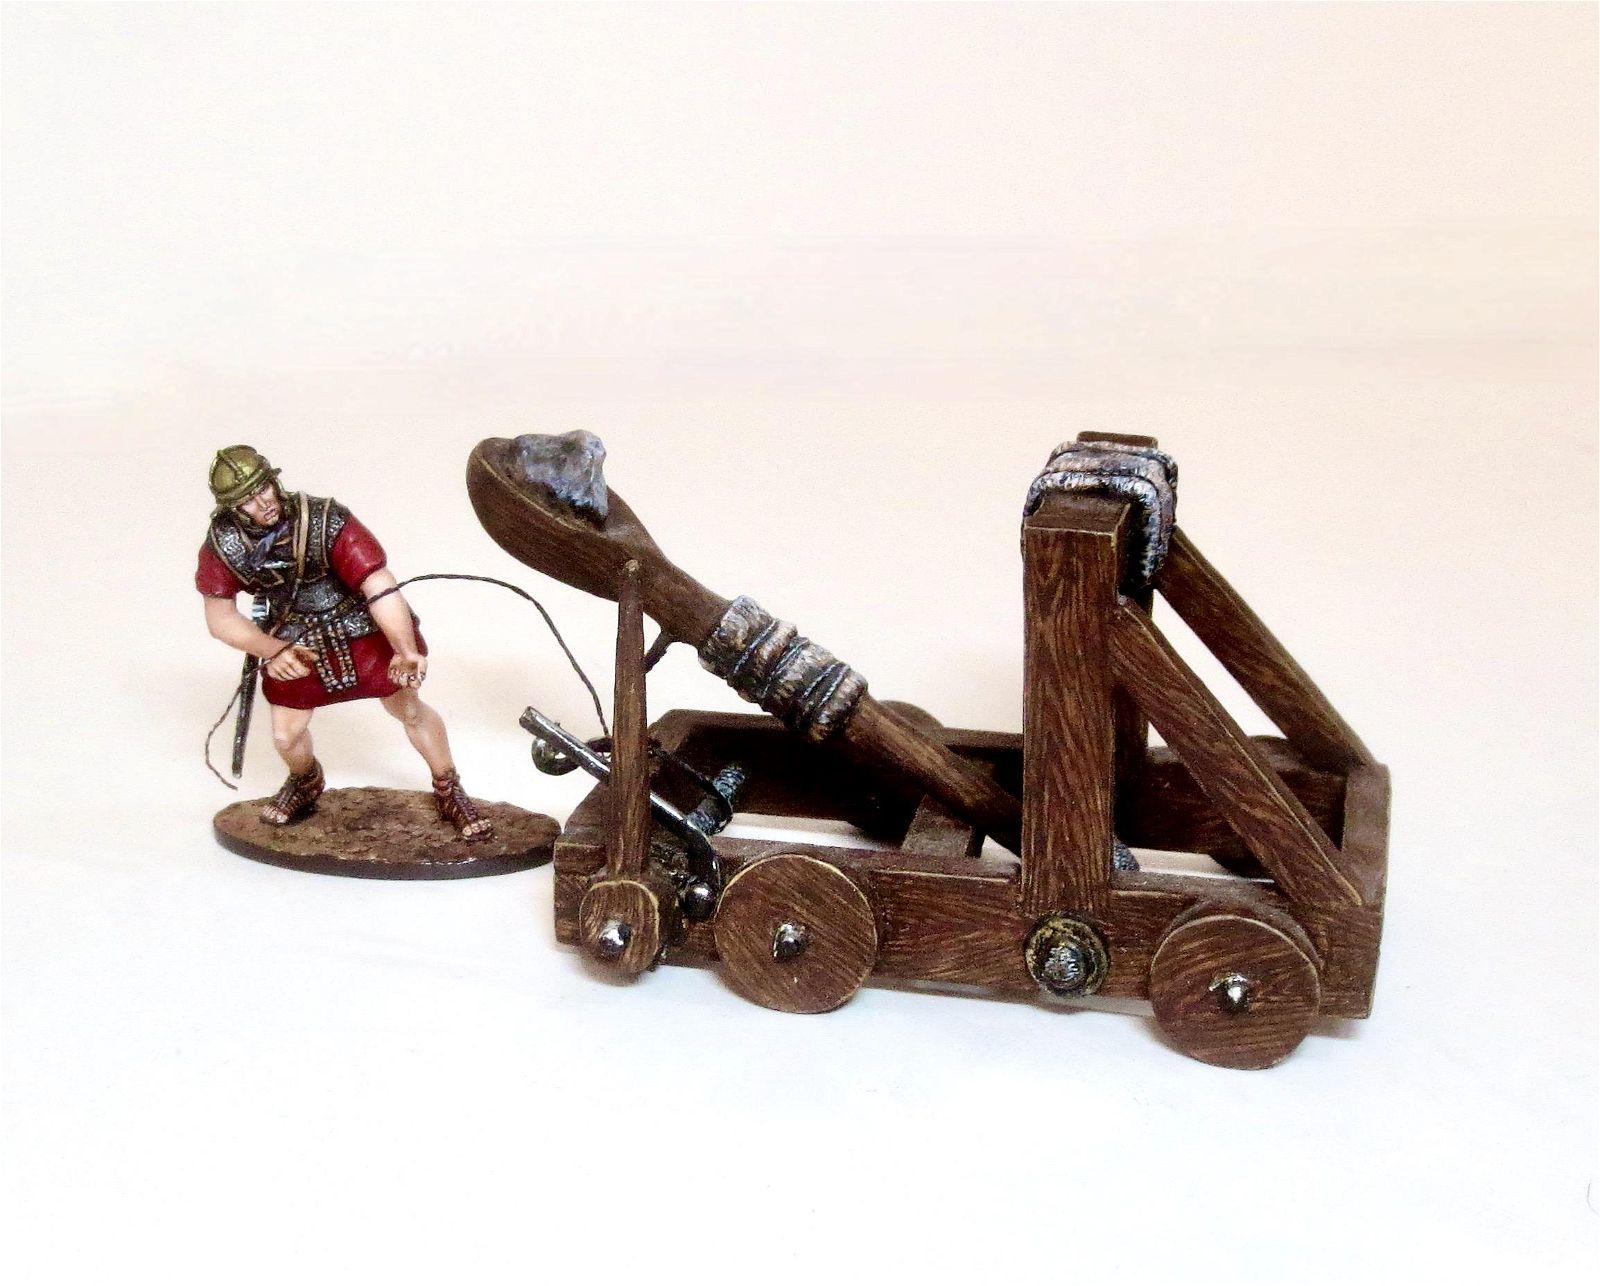 St. Petersburg Roman Catapult & Crewman